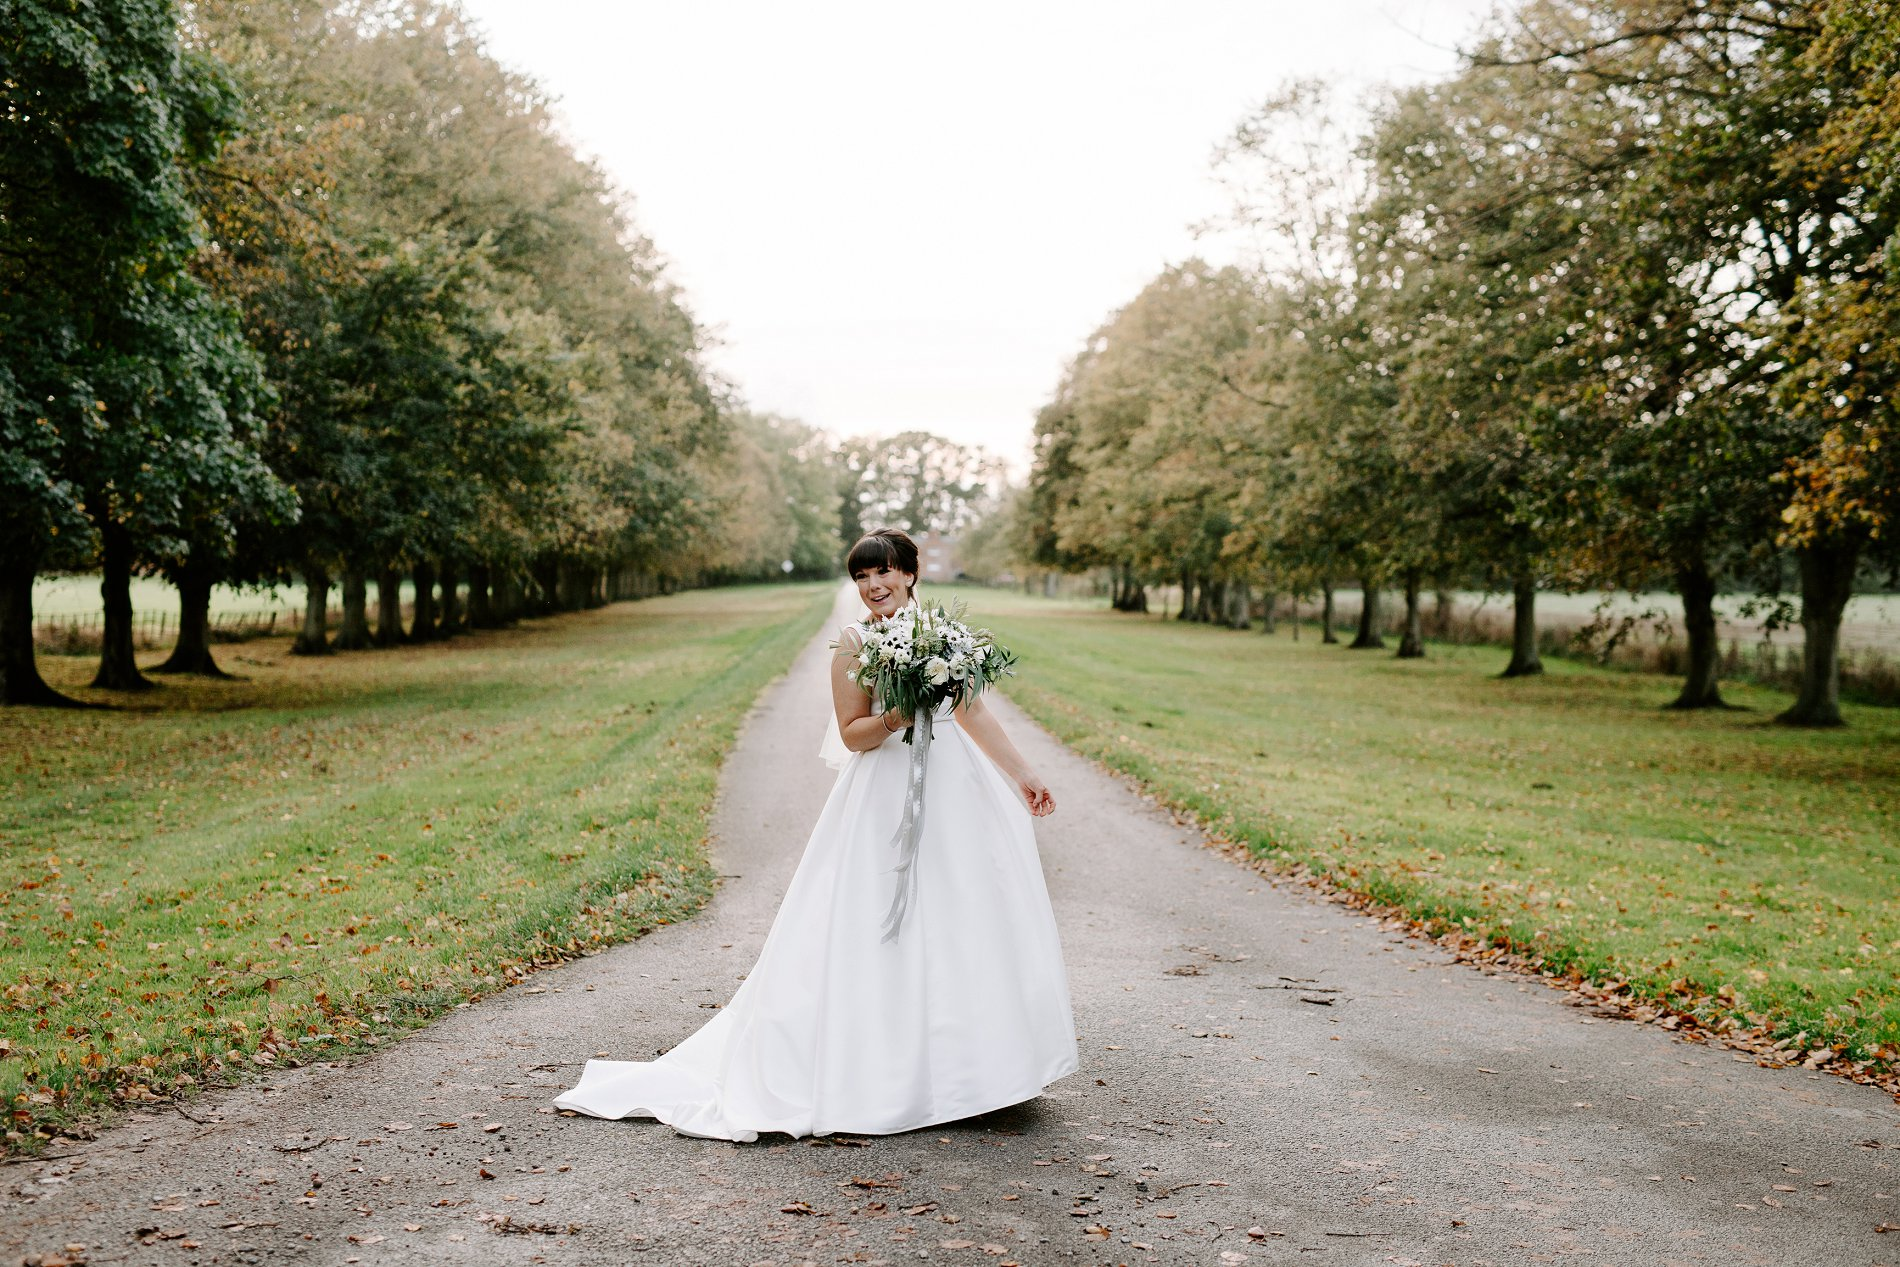 An Elegant White Wedding at Thicket Priory (c) Carla Whittingham Photography (83)